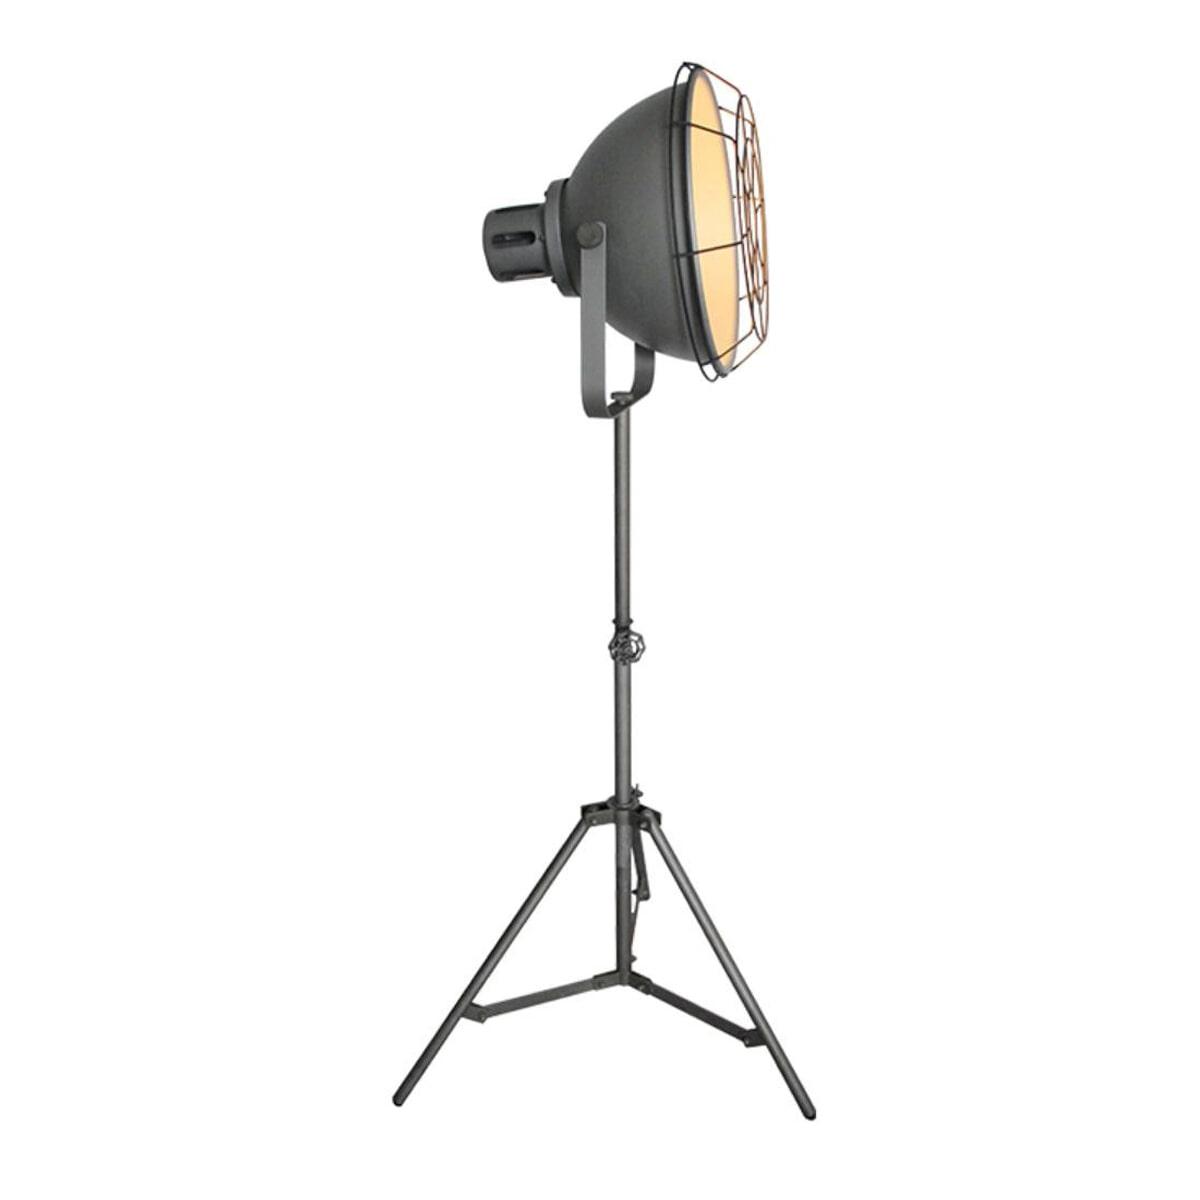 LABEL51 vloerlamp 'Max', kleur Burned Steel